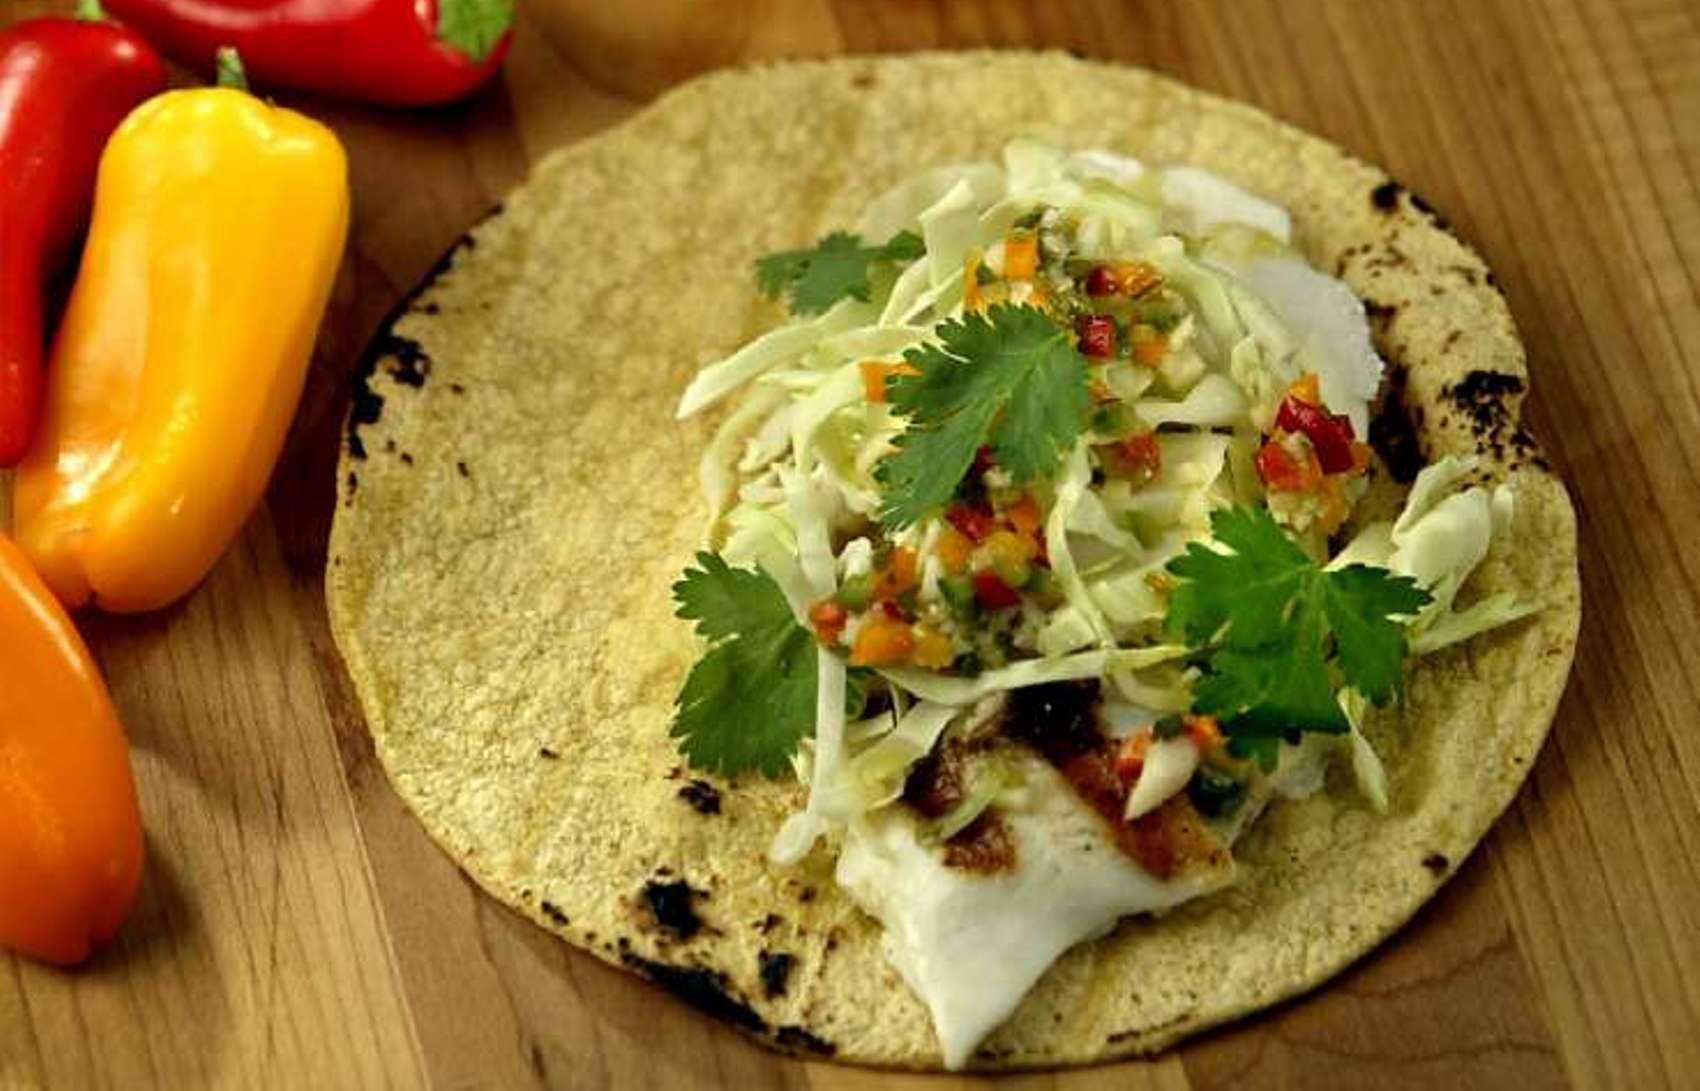 Fix this quick halibut recipe for taco tuesday la times for Halibut fish tacos